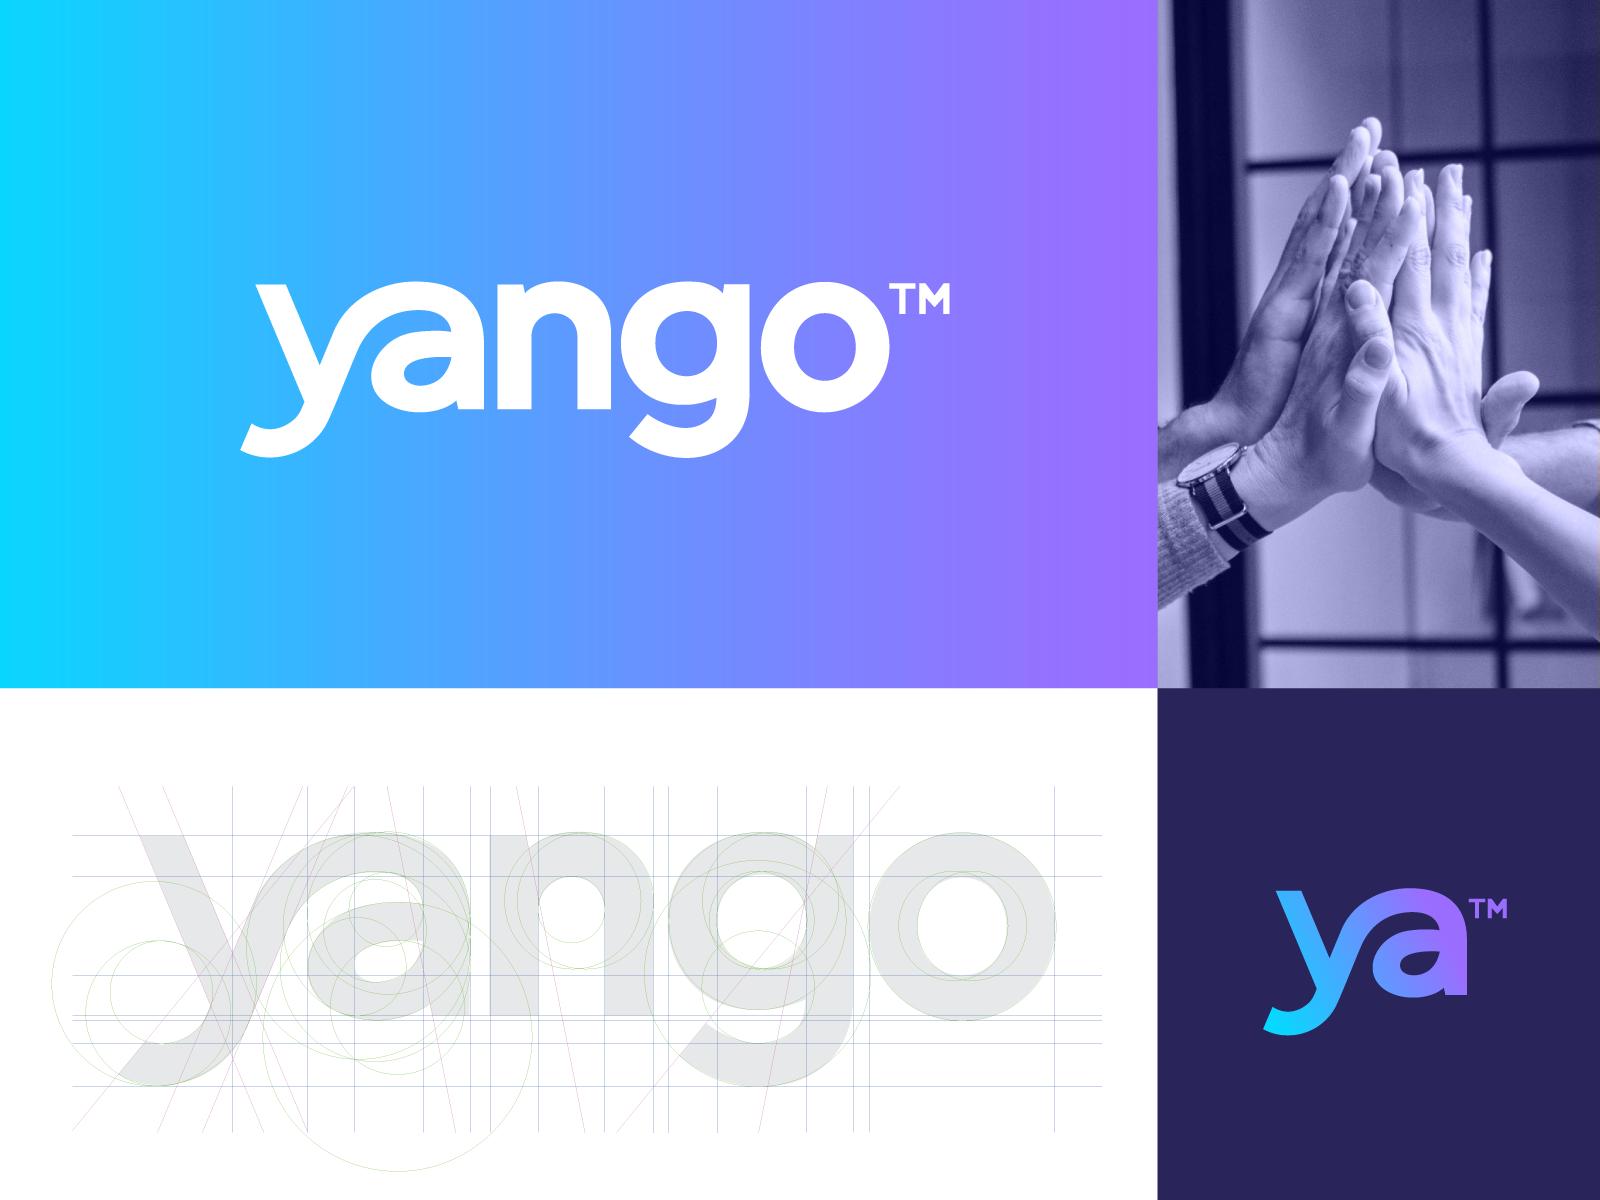 Yango approved 4x